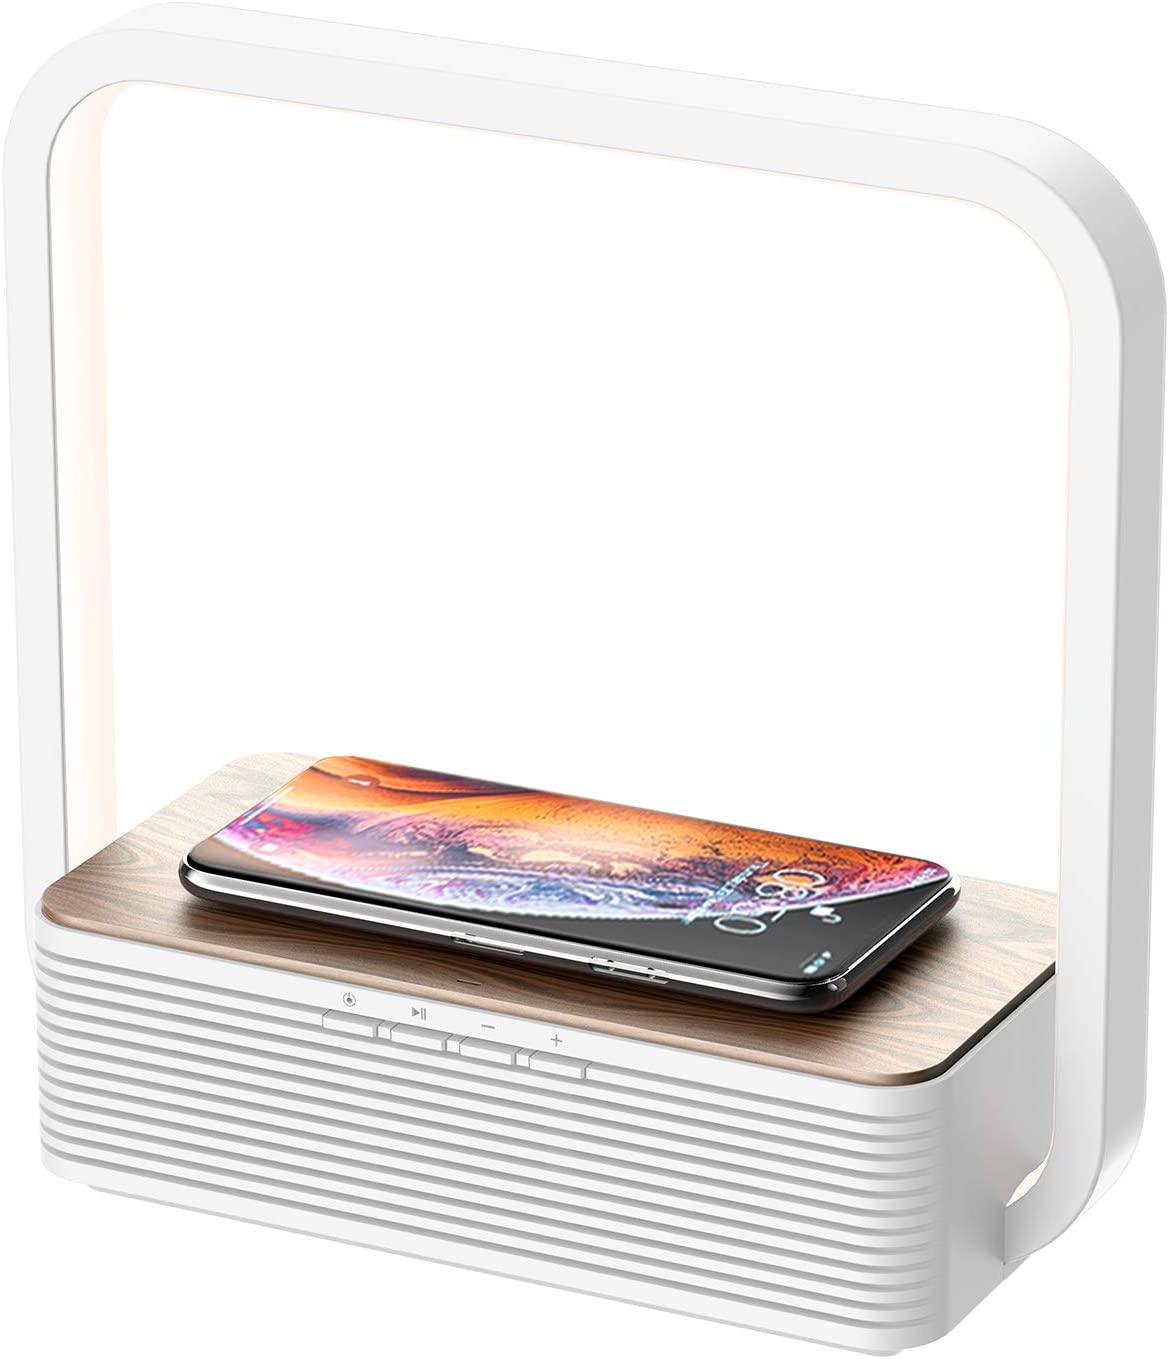 WILIT A15B Lámpara de Mesilla, Cargador Inalámbrico y Altavoz Bluetooth, Lámpara de Mesa de Madera Regulable 60 LED, Qi Cargador Inducción para Samsung Galaxy S10/S9/Note 10, iPhone 11/XS/XR/8, Blanco [Clase de eficiencia energética A++]